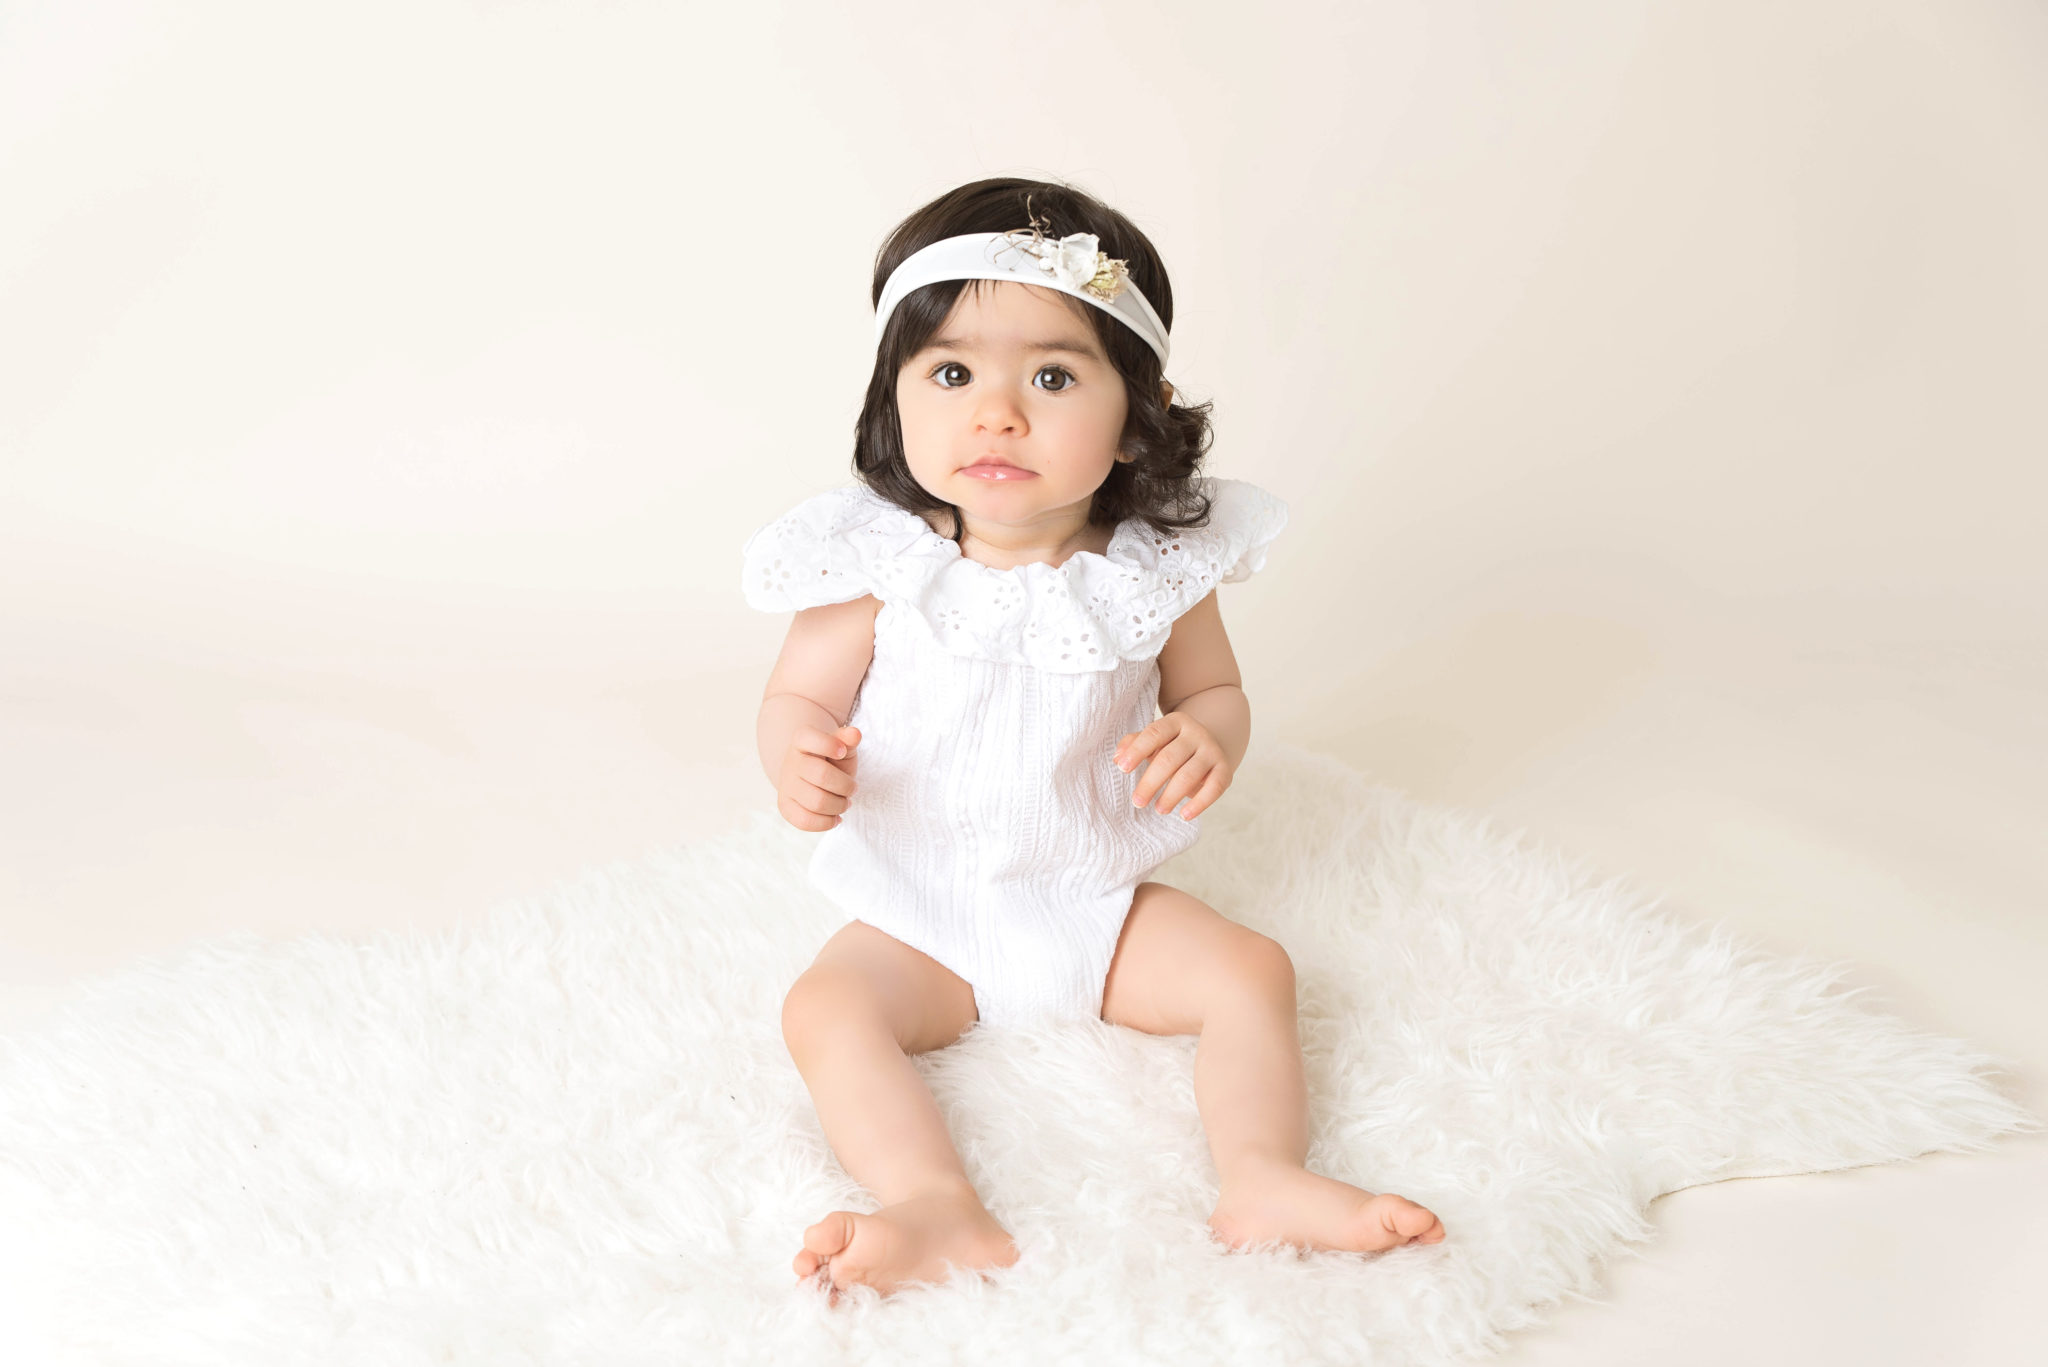 Photographe bébé oise seine et marne val d'oise ainse (17)